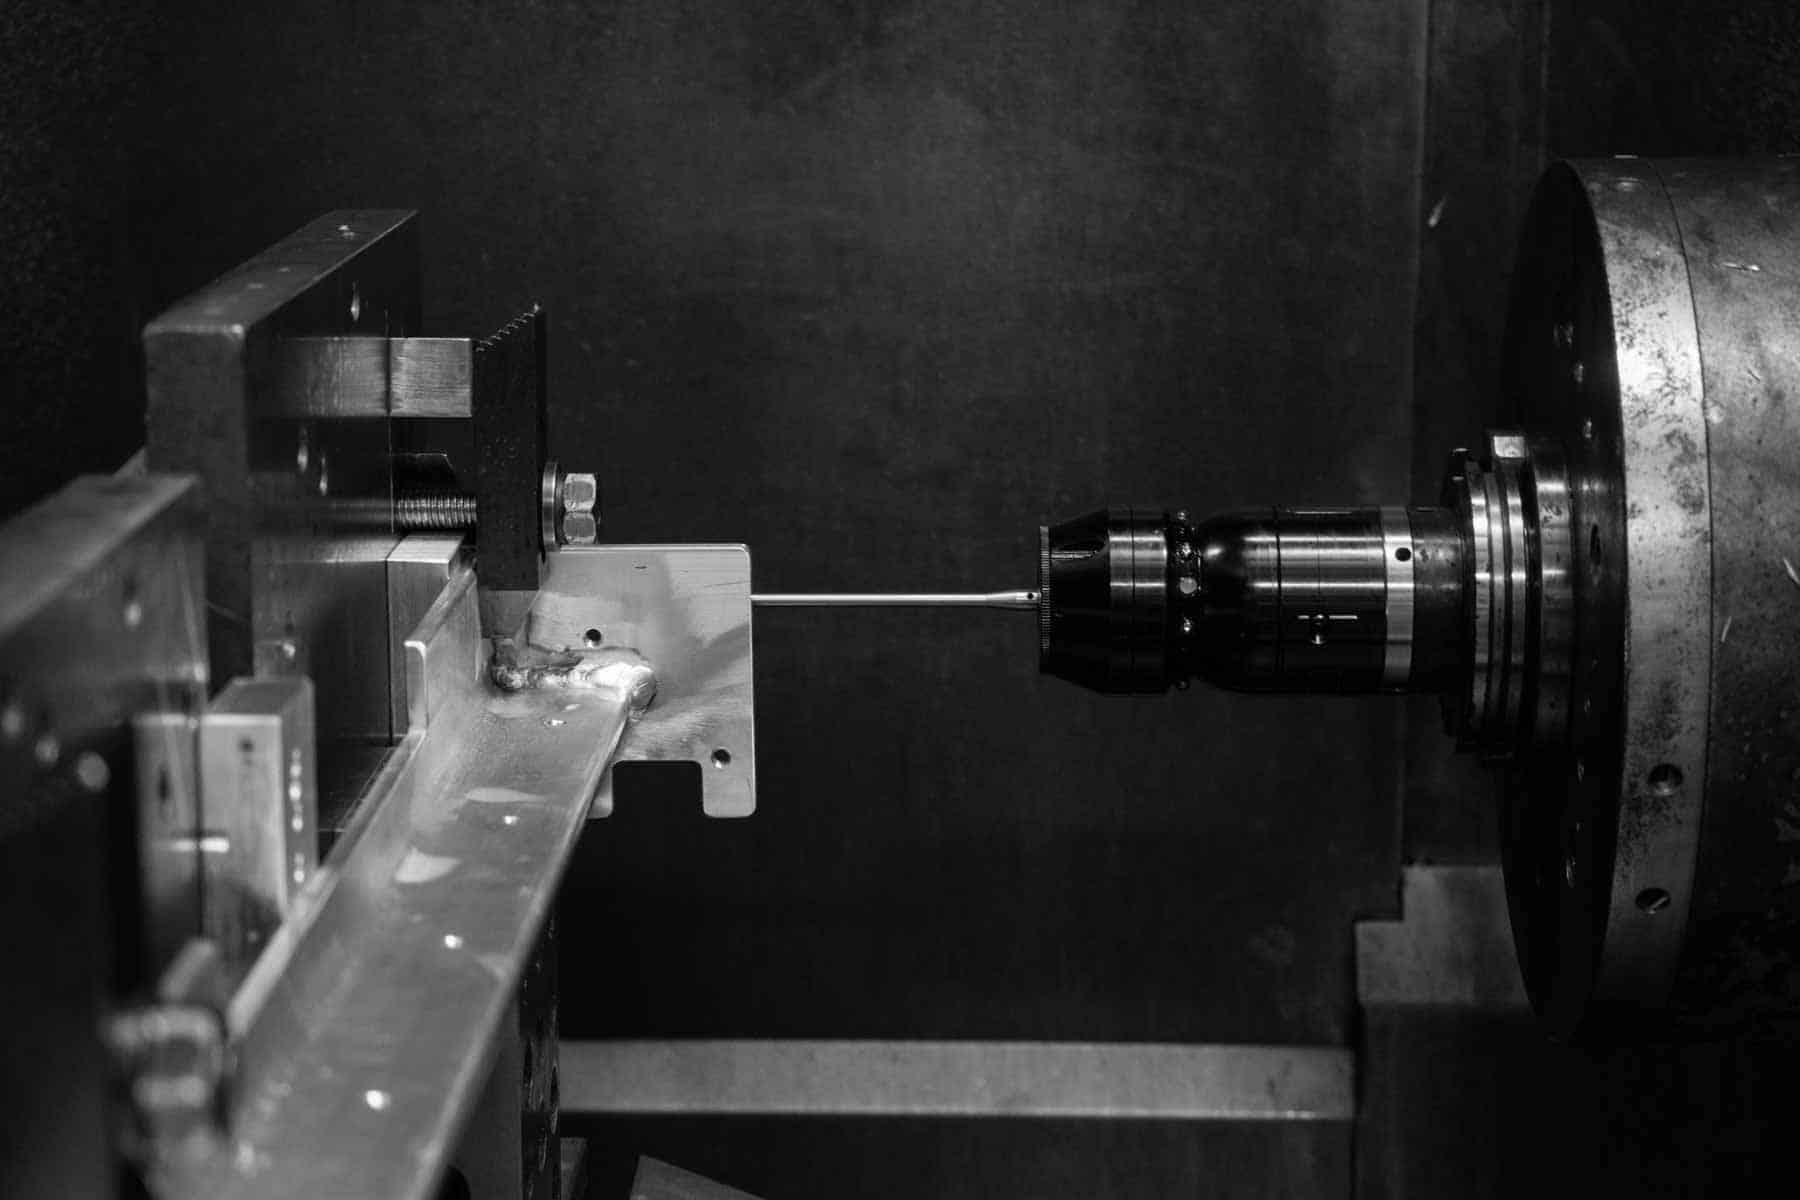 CNC horizontal milling machine makes tight-tolerance parts